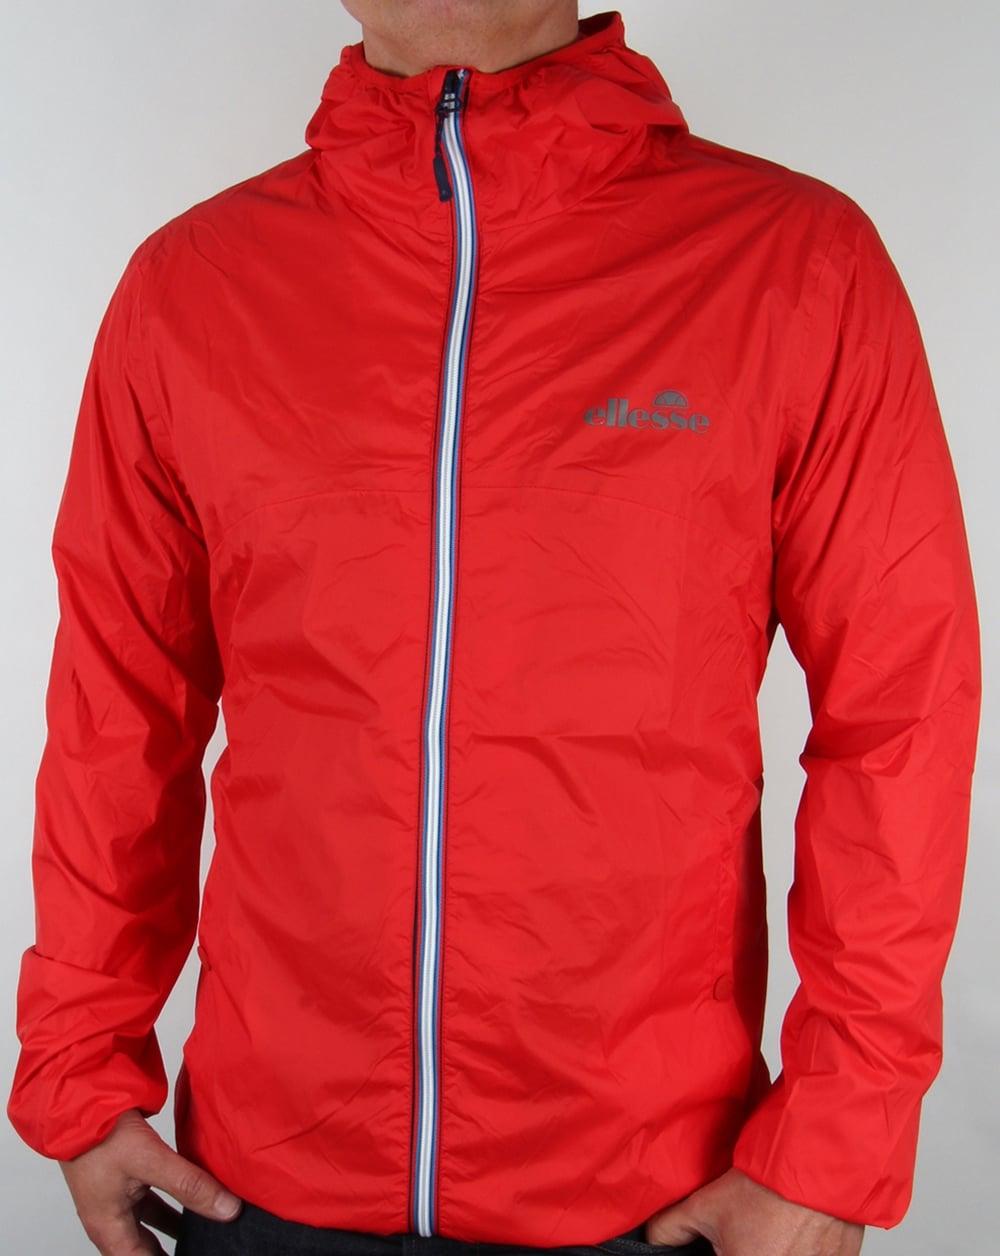 ellesse xaviero jacket red coat hooded performace mens. Black Bedroom Furniture Sets. Home Design Ideas